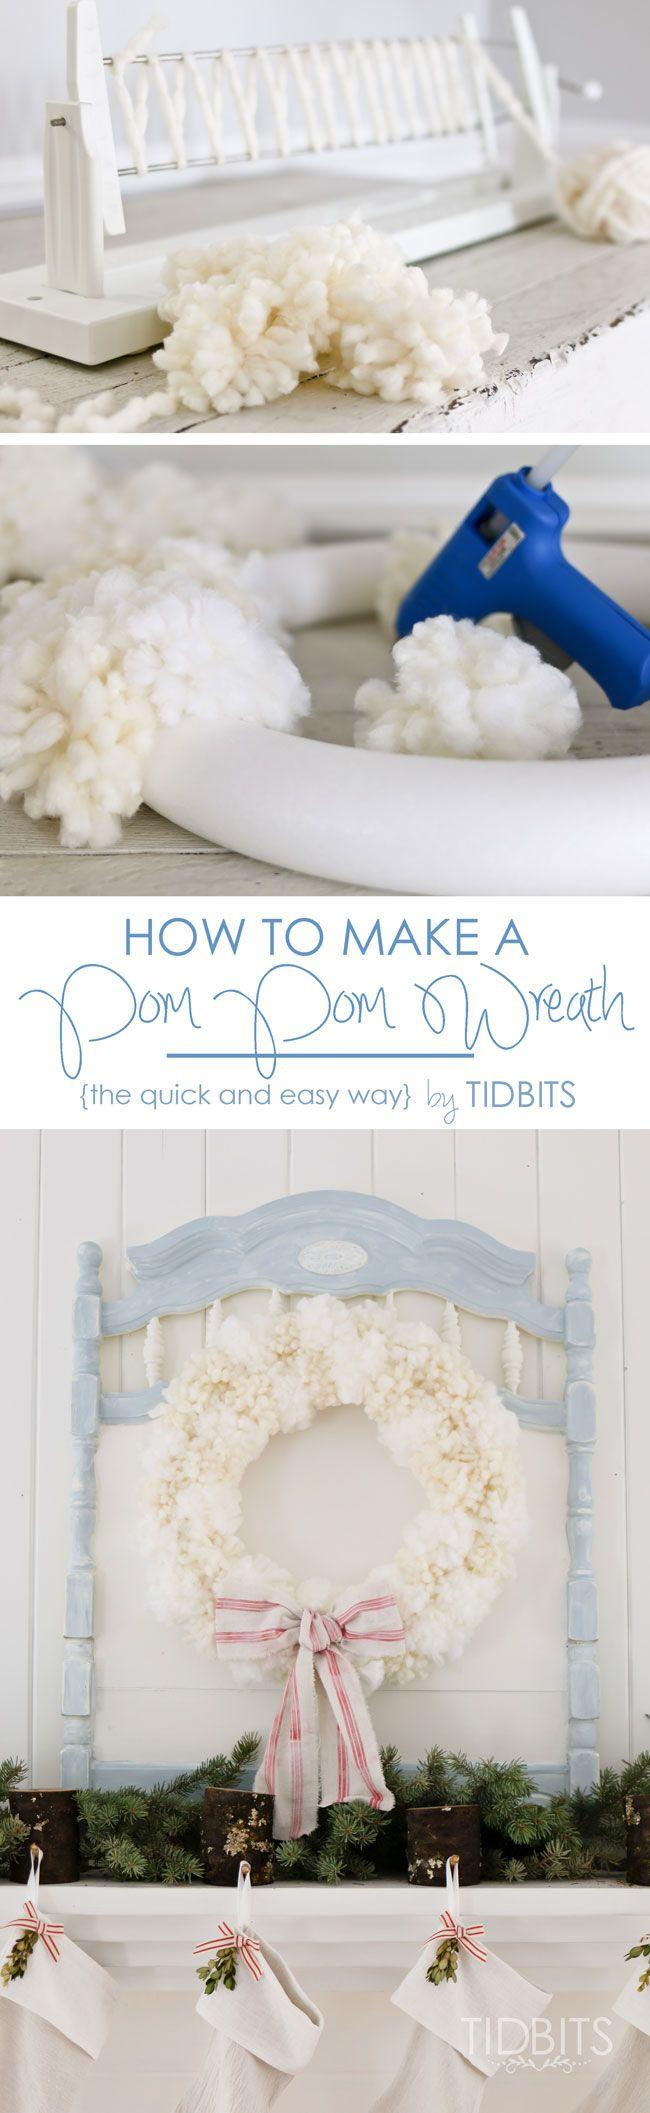 How to Make a Pom Pom Wreath - Tidbits